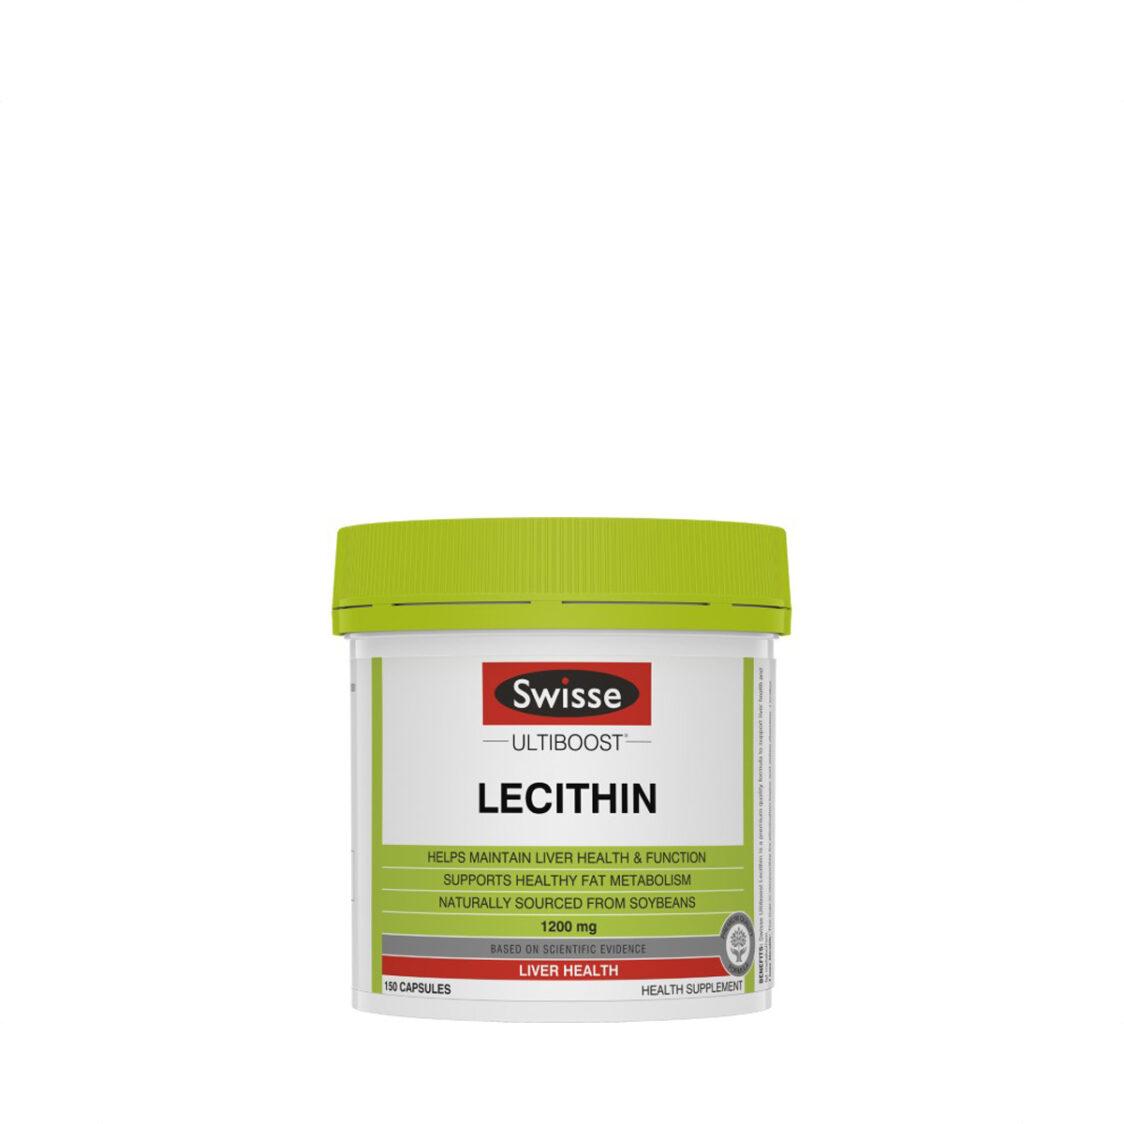 Swisse Ultiboost Lecithin 150s